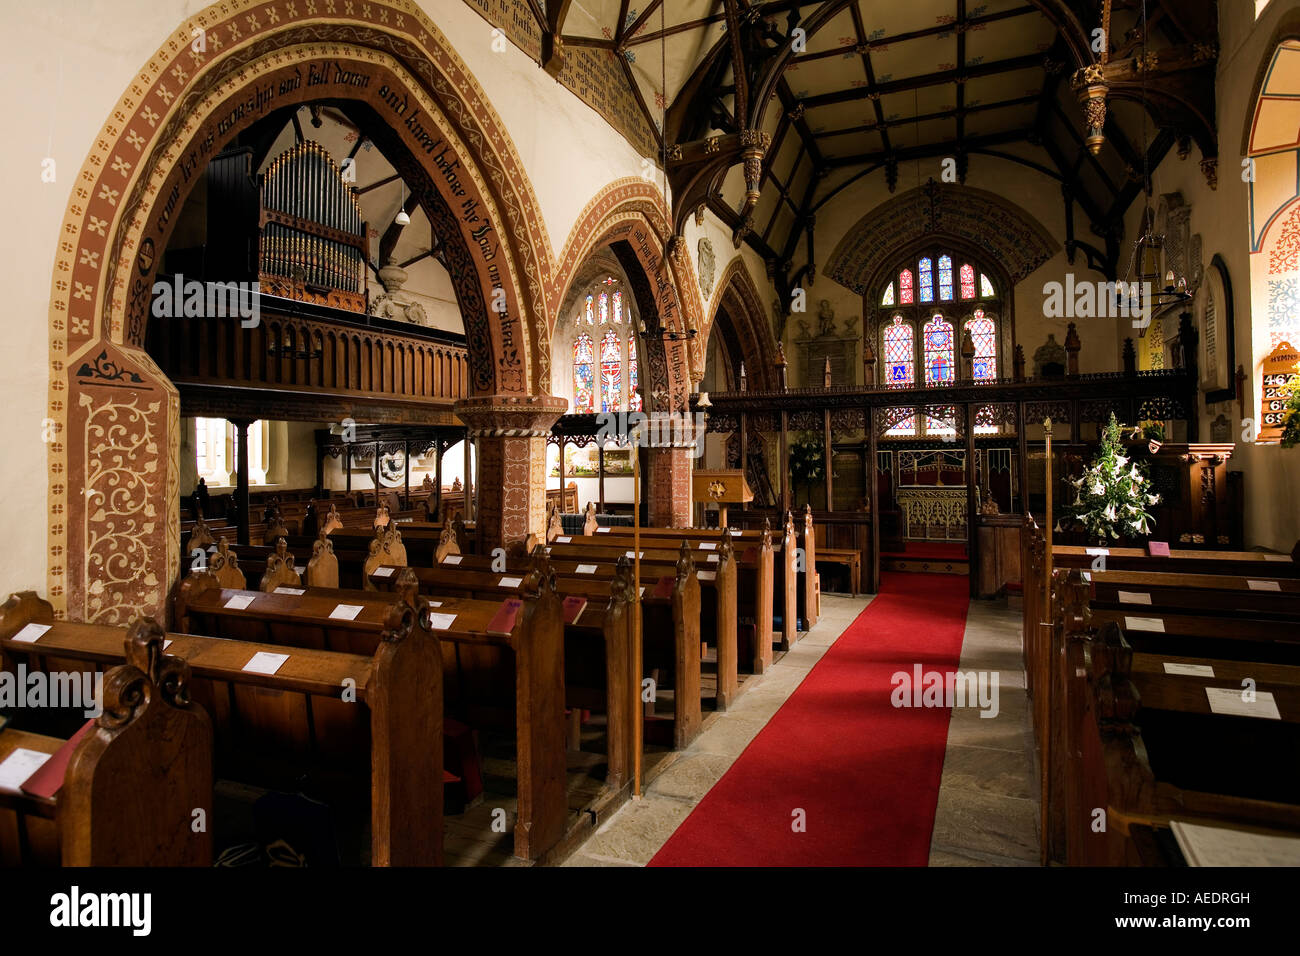 UK Shropshire Llanyblodwel St Michaels Church Gothic Revival Interior